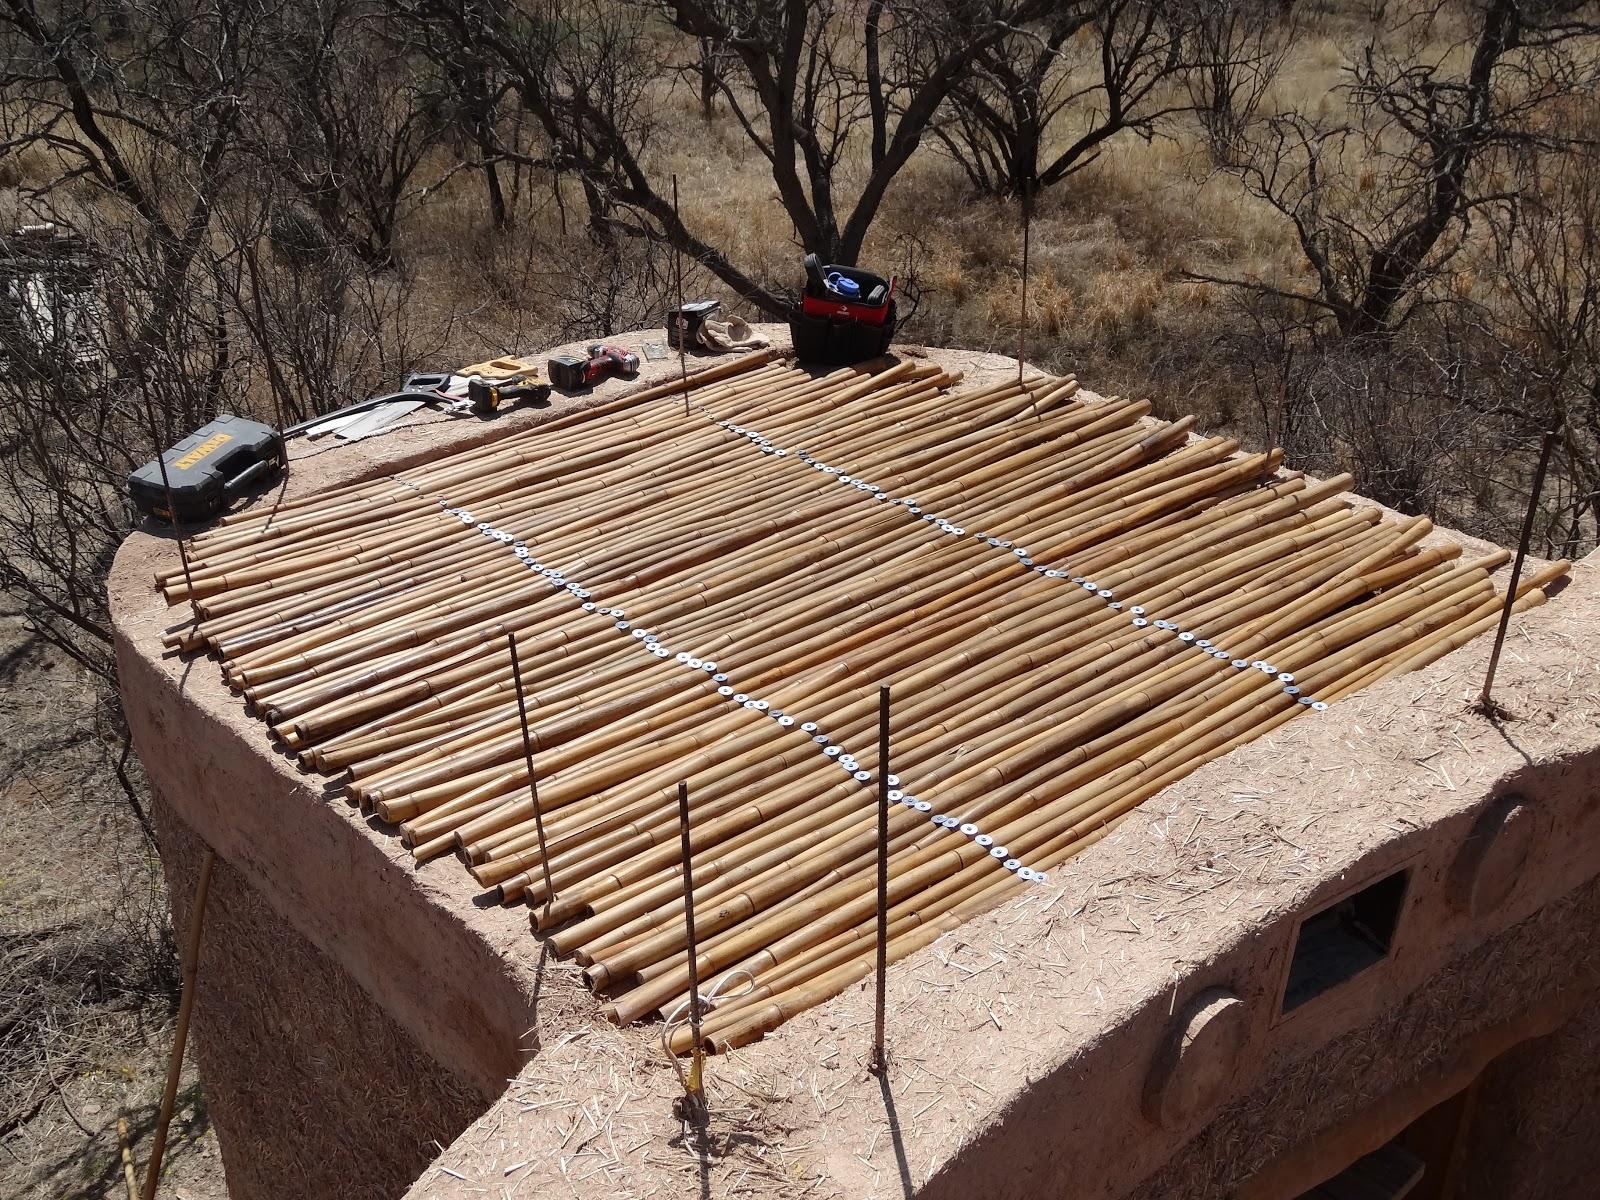 Cob Art Studio Arivaca Arizona Bamboo Ceiling for South Room